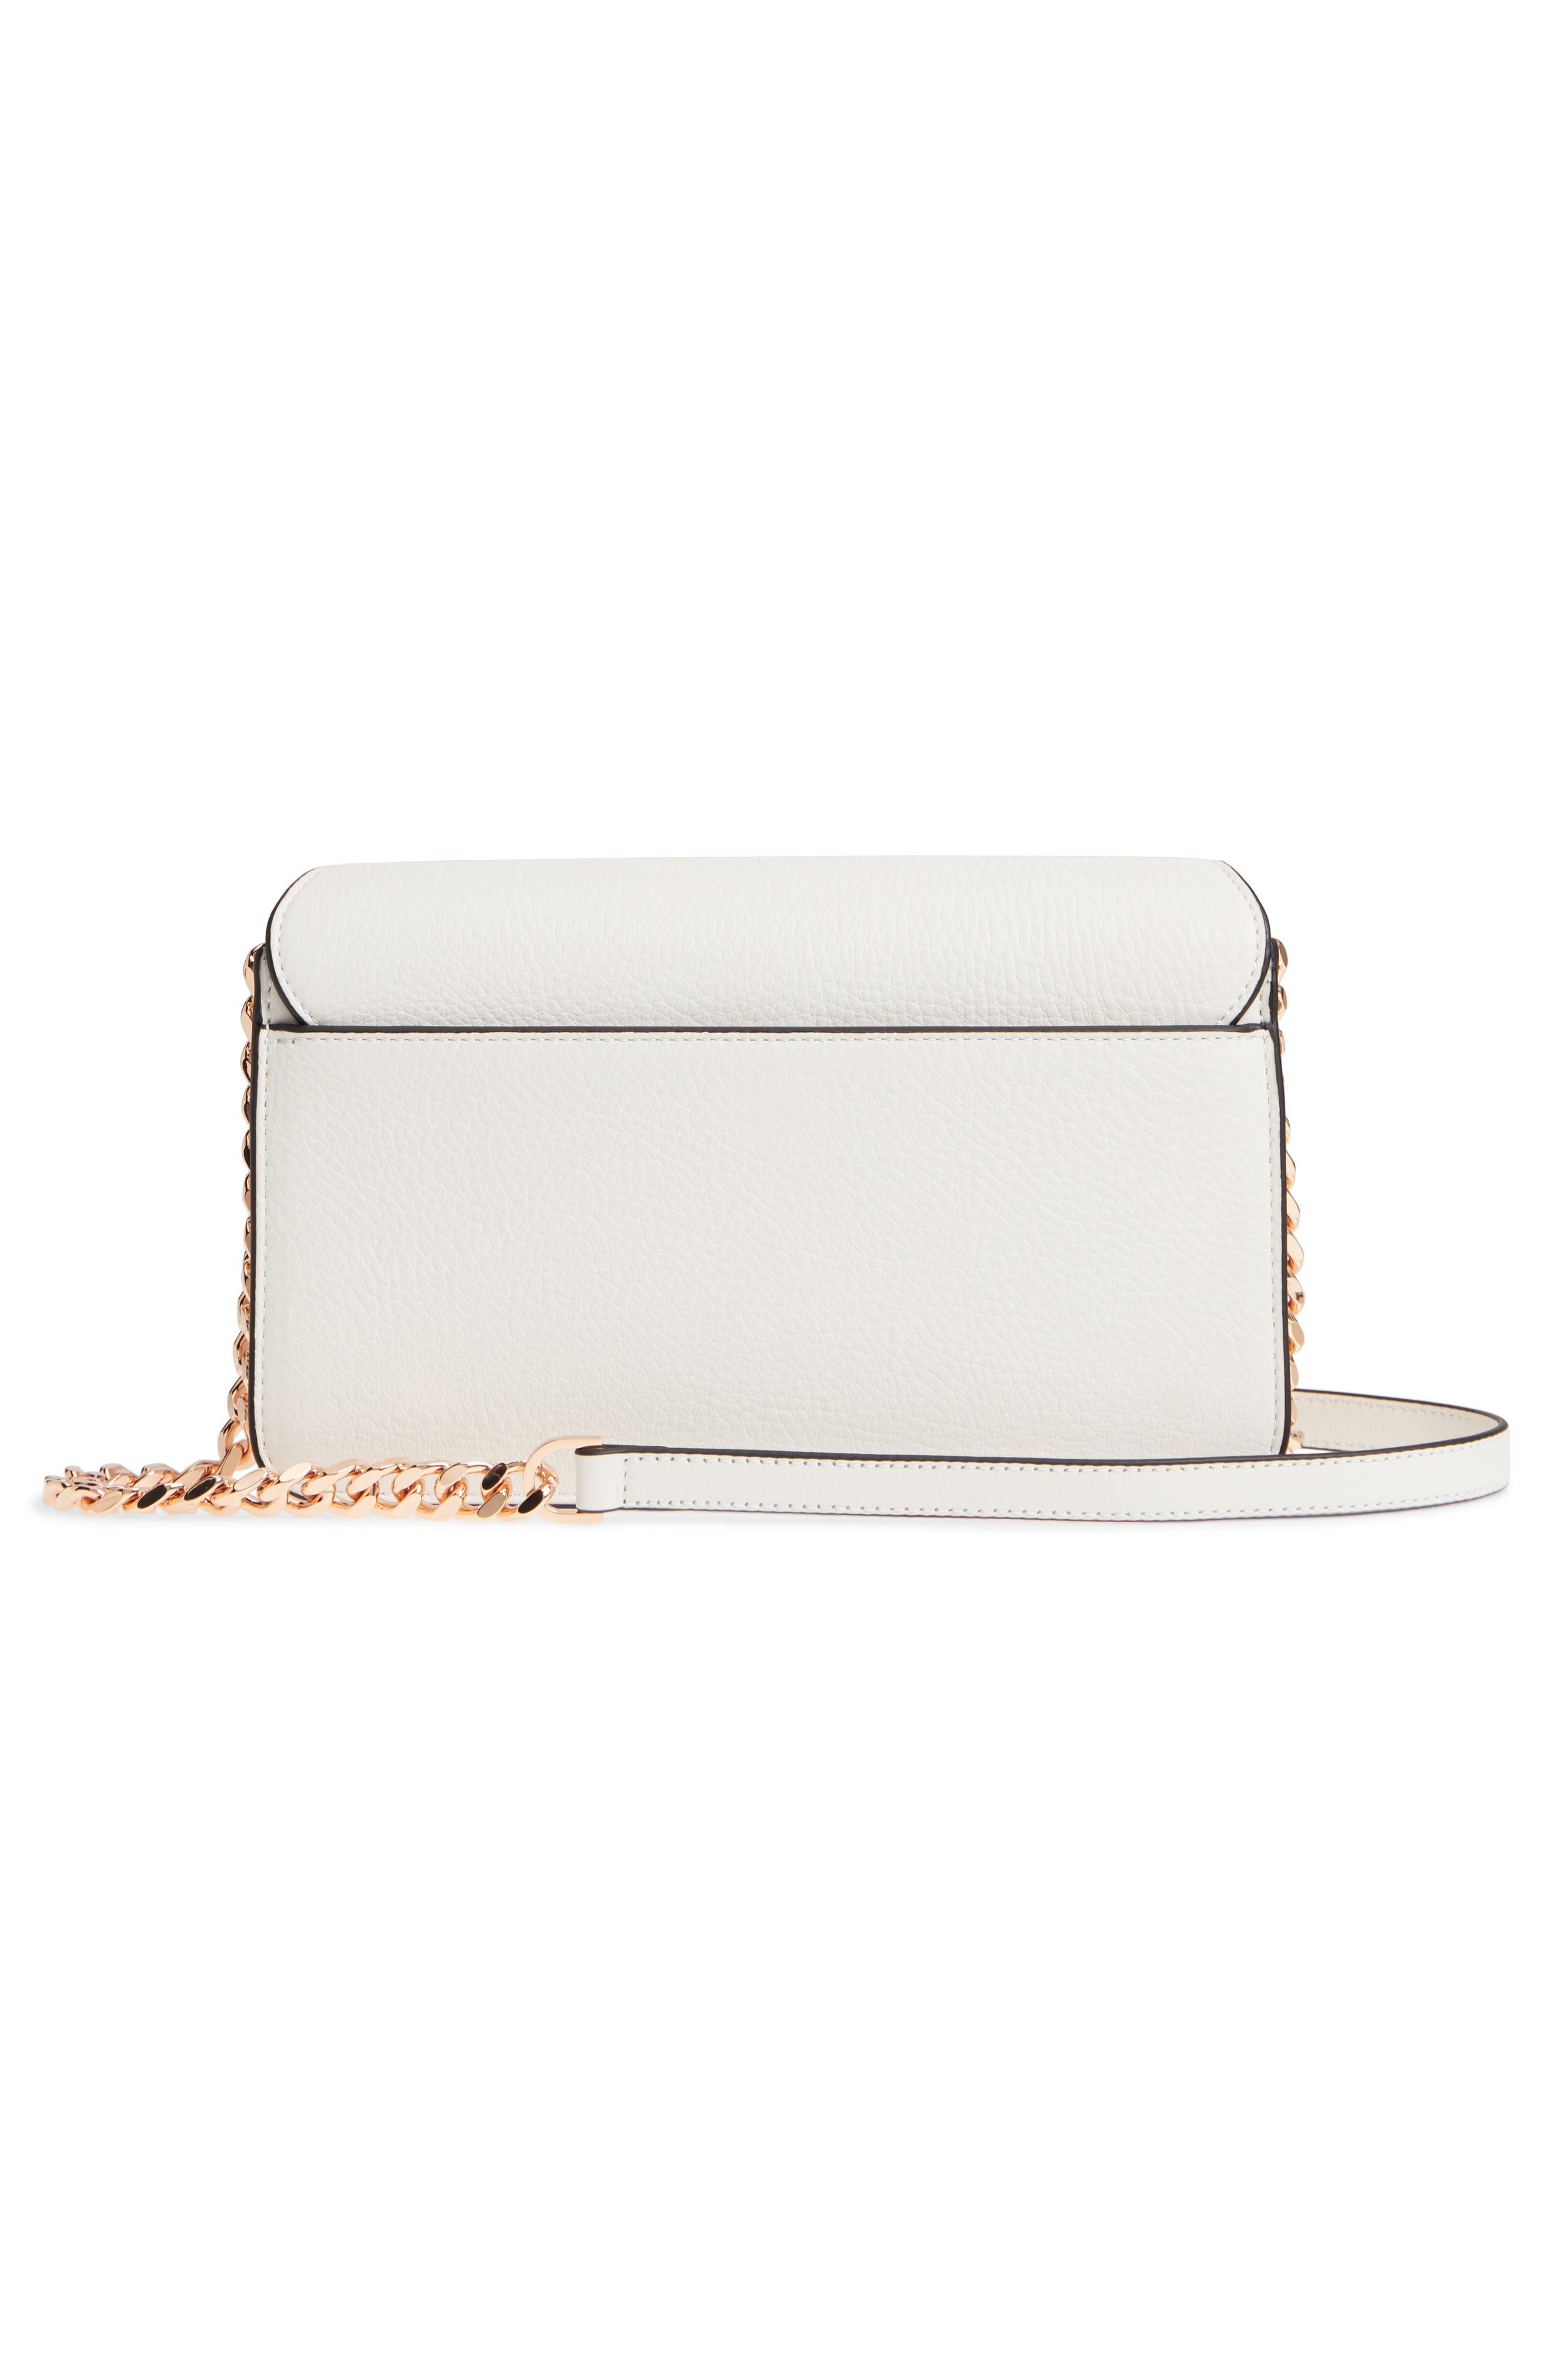 Cortney Nappa Leather Shoulder/Crossbody Bag,                             Alternate thumbnail 3, color,                             White/ Rose Gold